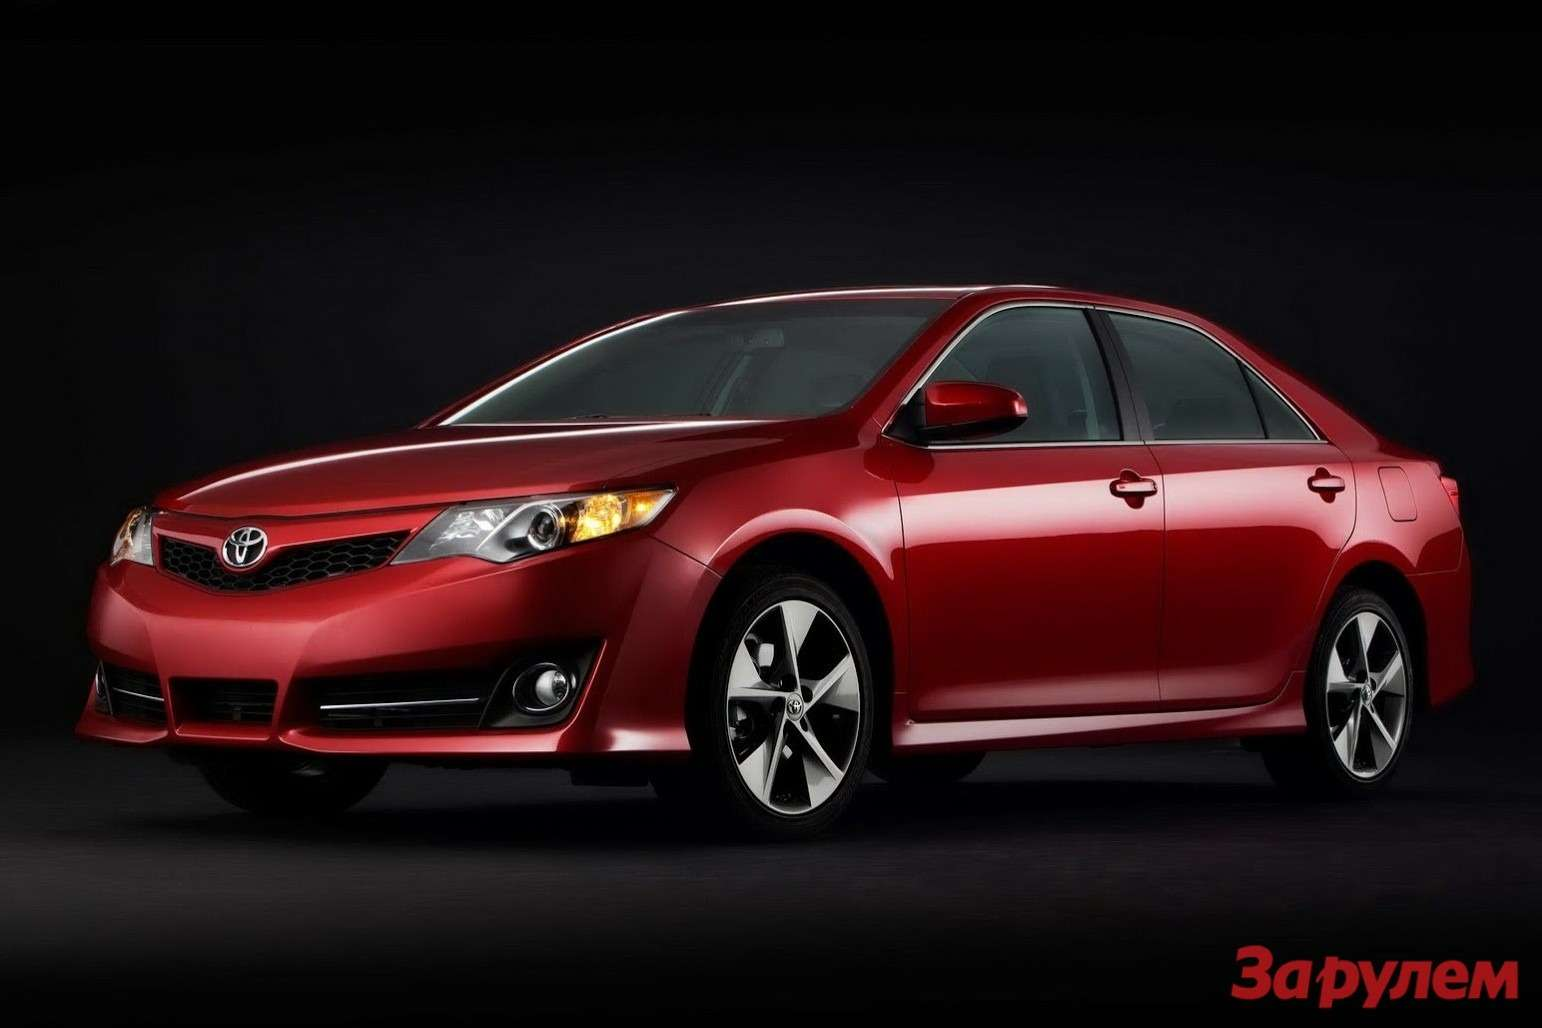 2013-Toyota-Camry[3]